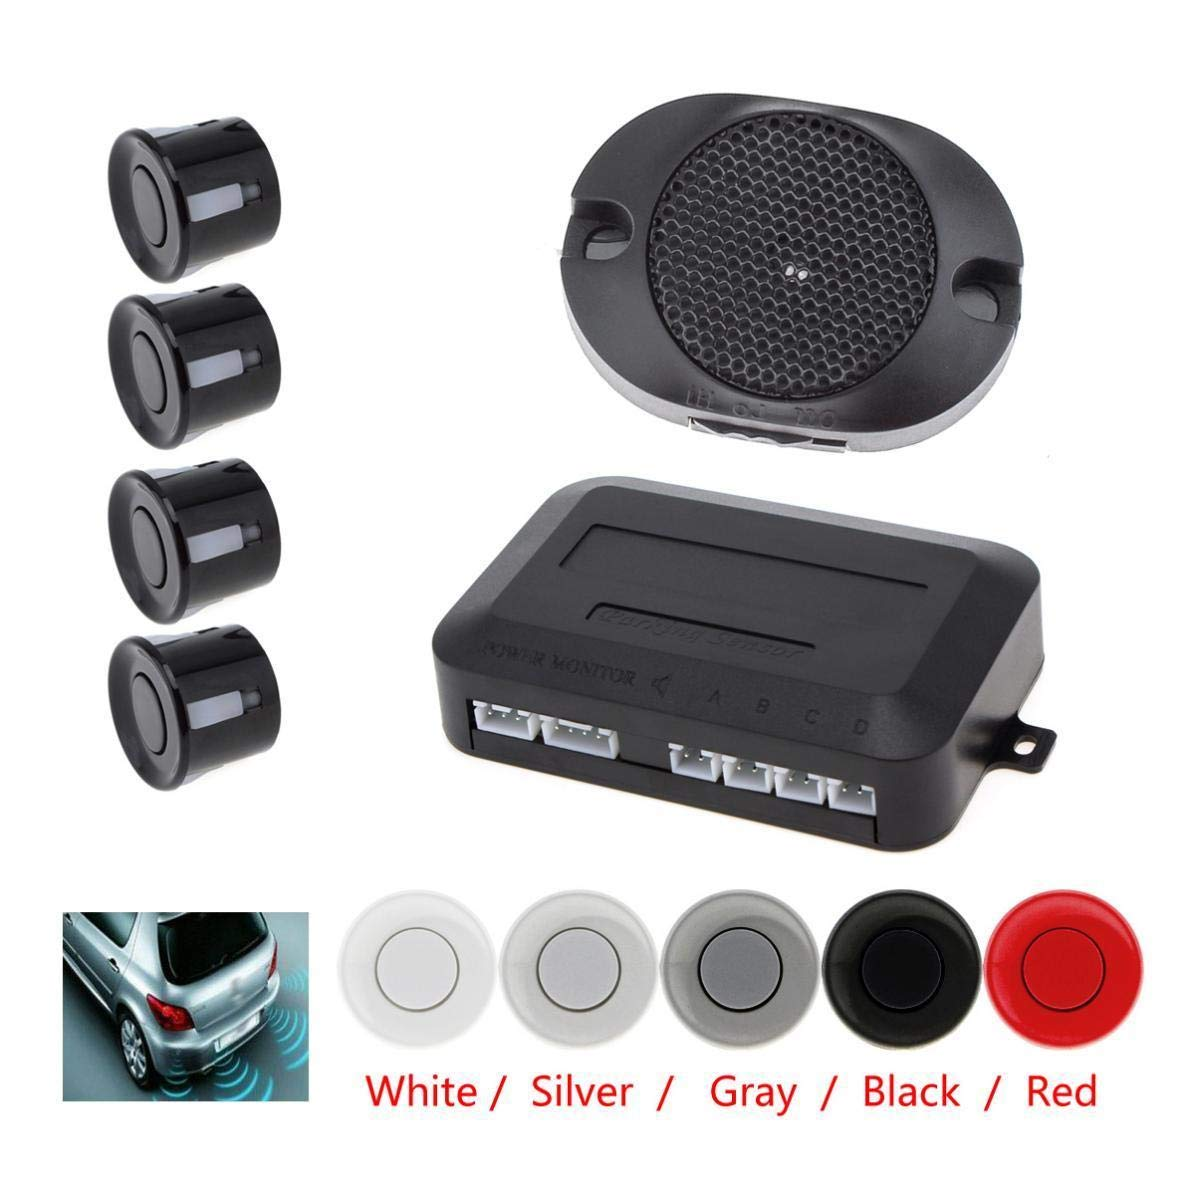 FidgetFidget 4 Sensors Waterproof Car Parking System with Audible Alarm & Back Car Assistant Red